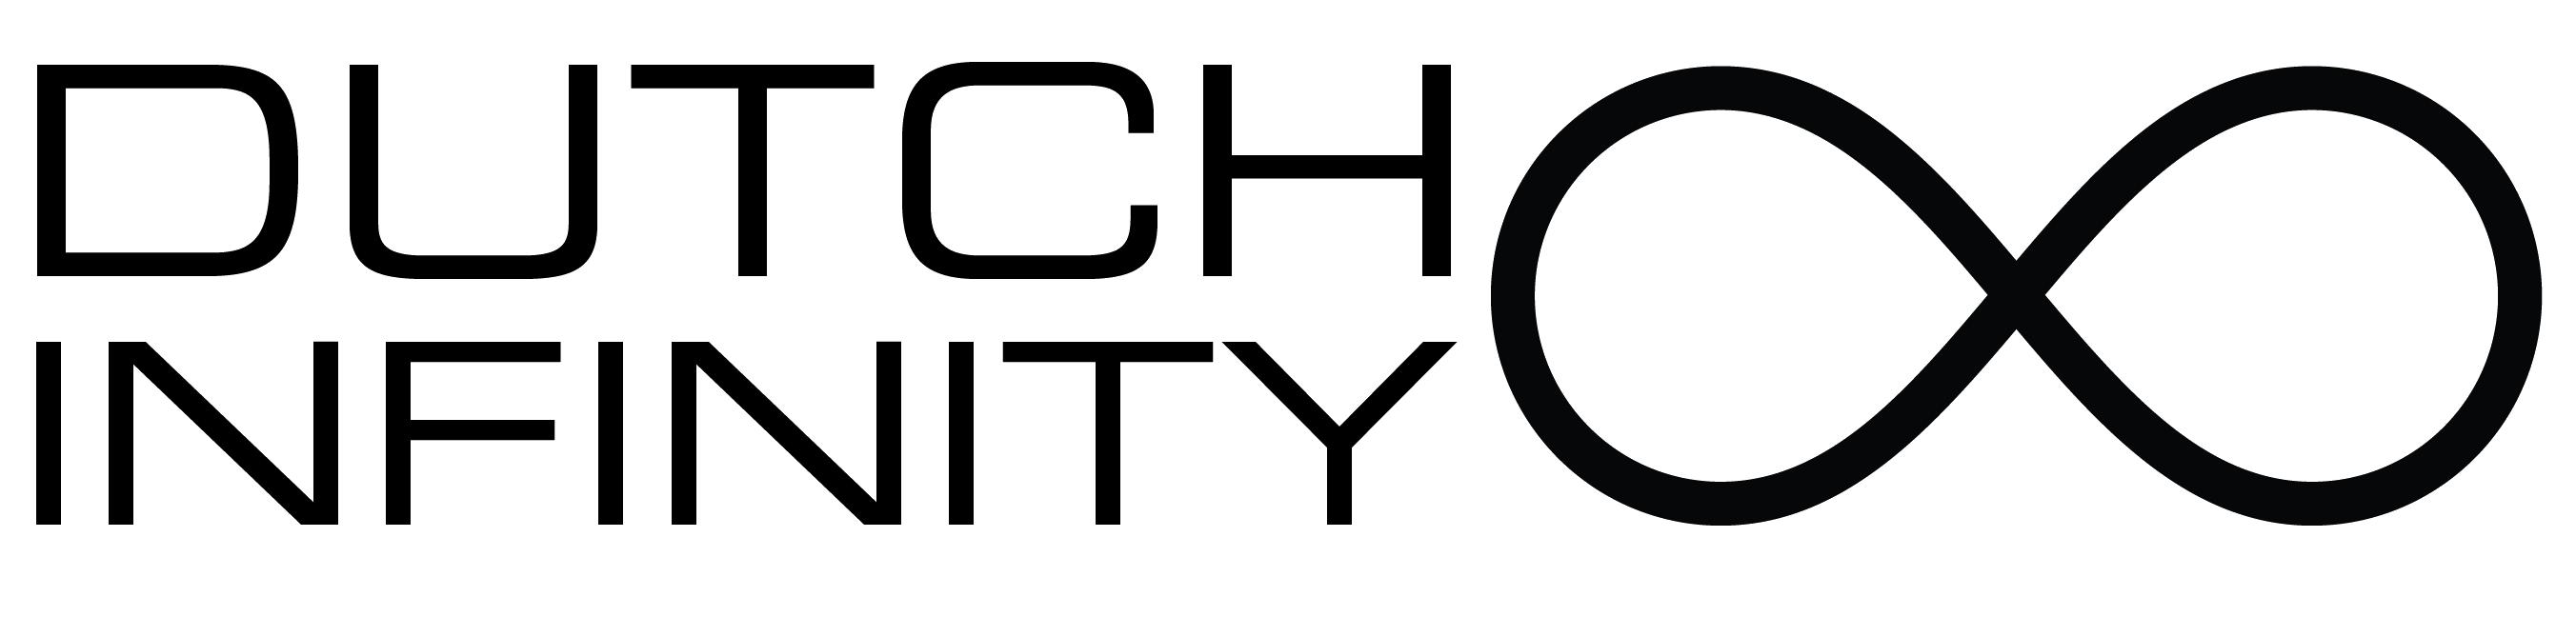 dutch-infinity-solo-black-no-background